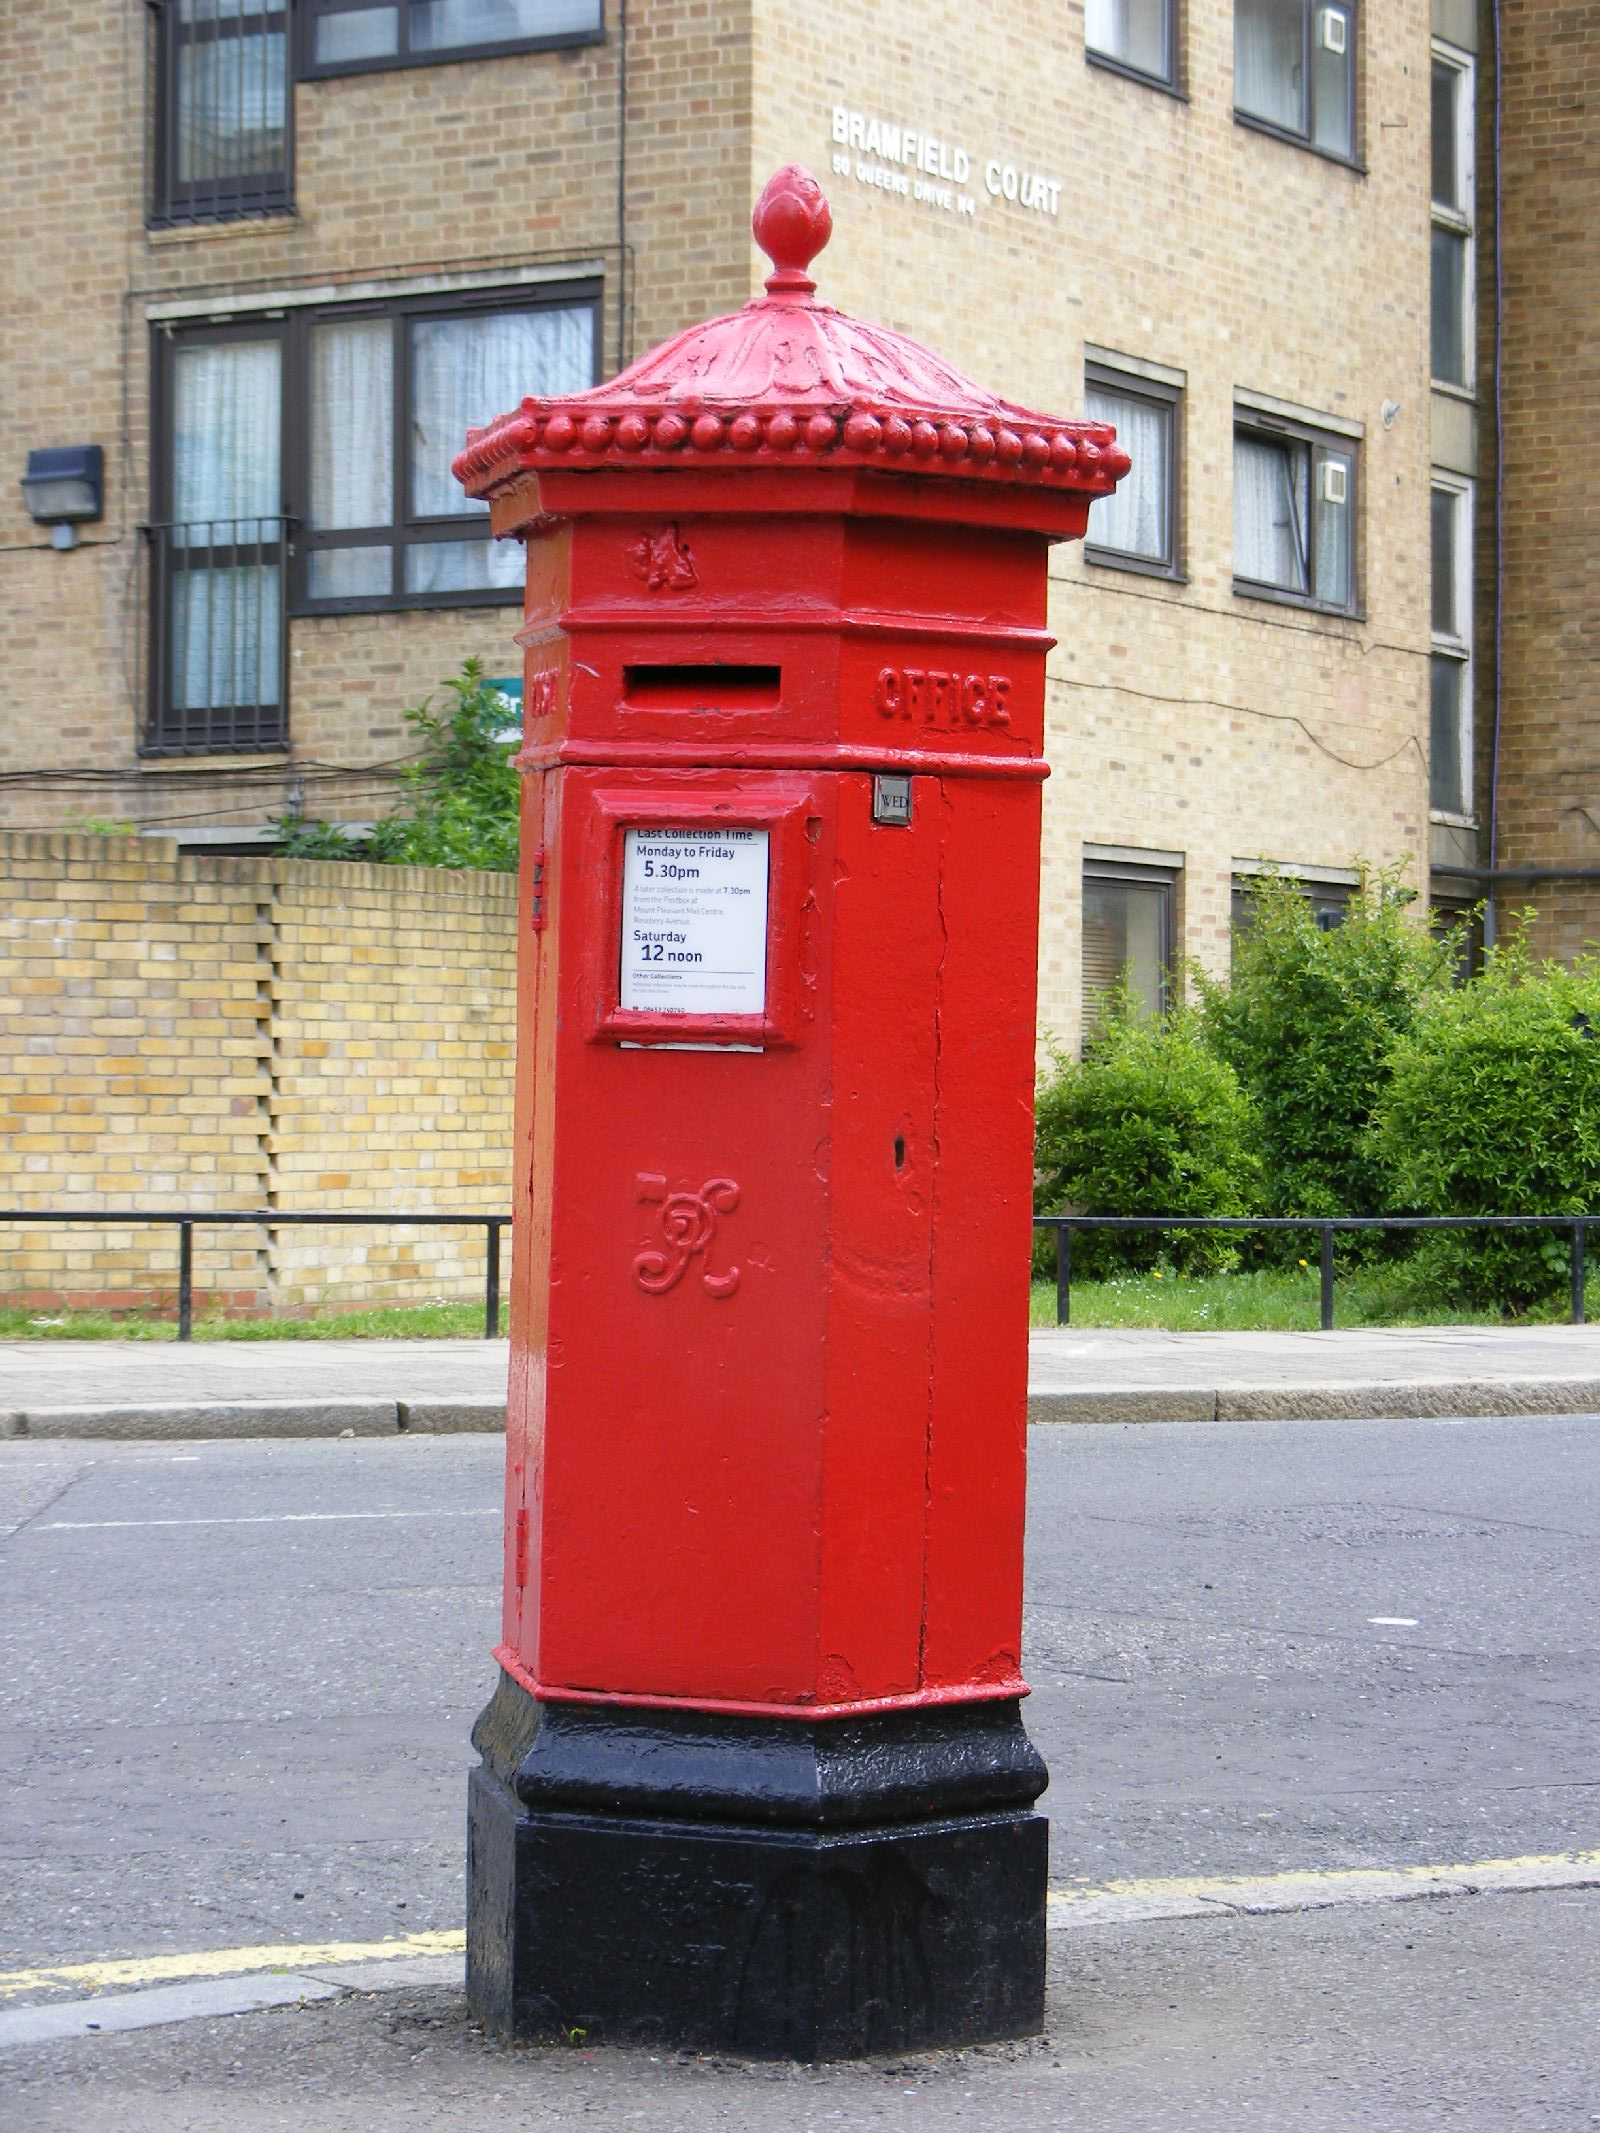 File:Victorian Penfold Letter Box, N4 - Flickr - sludgegulper.jpg ...